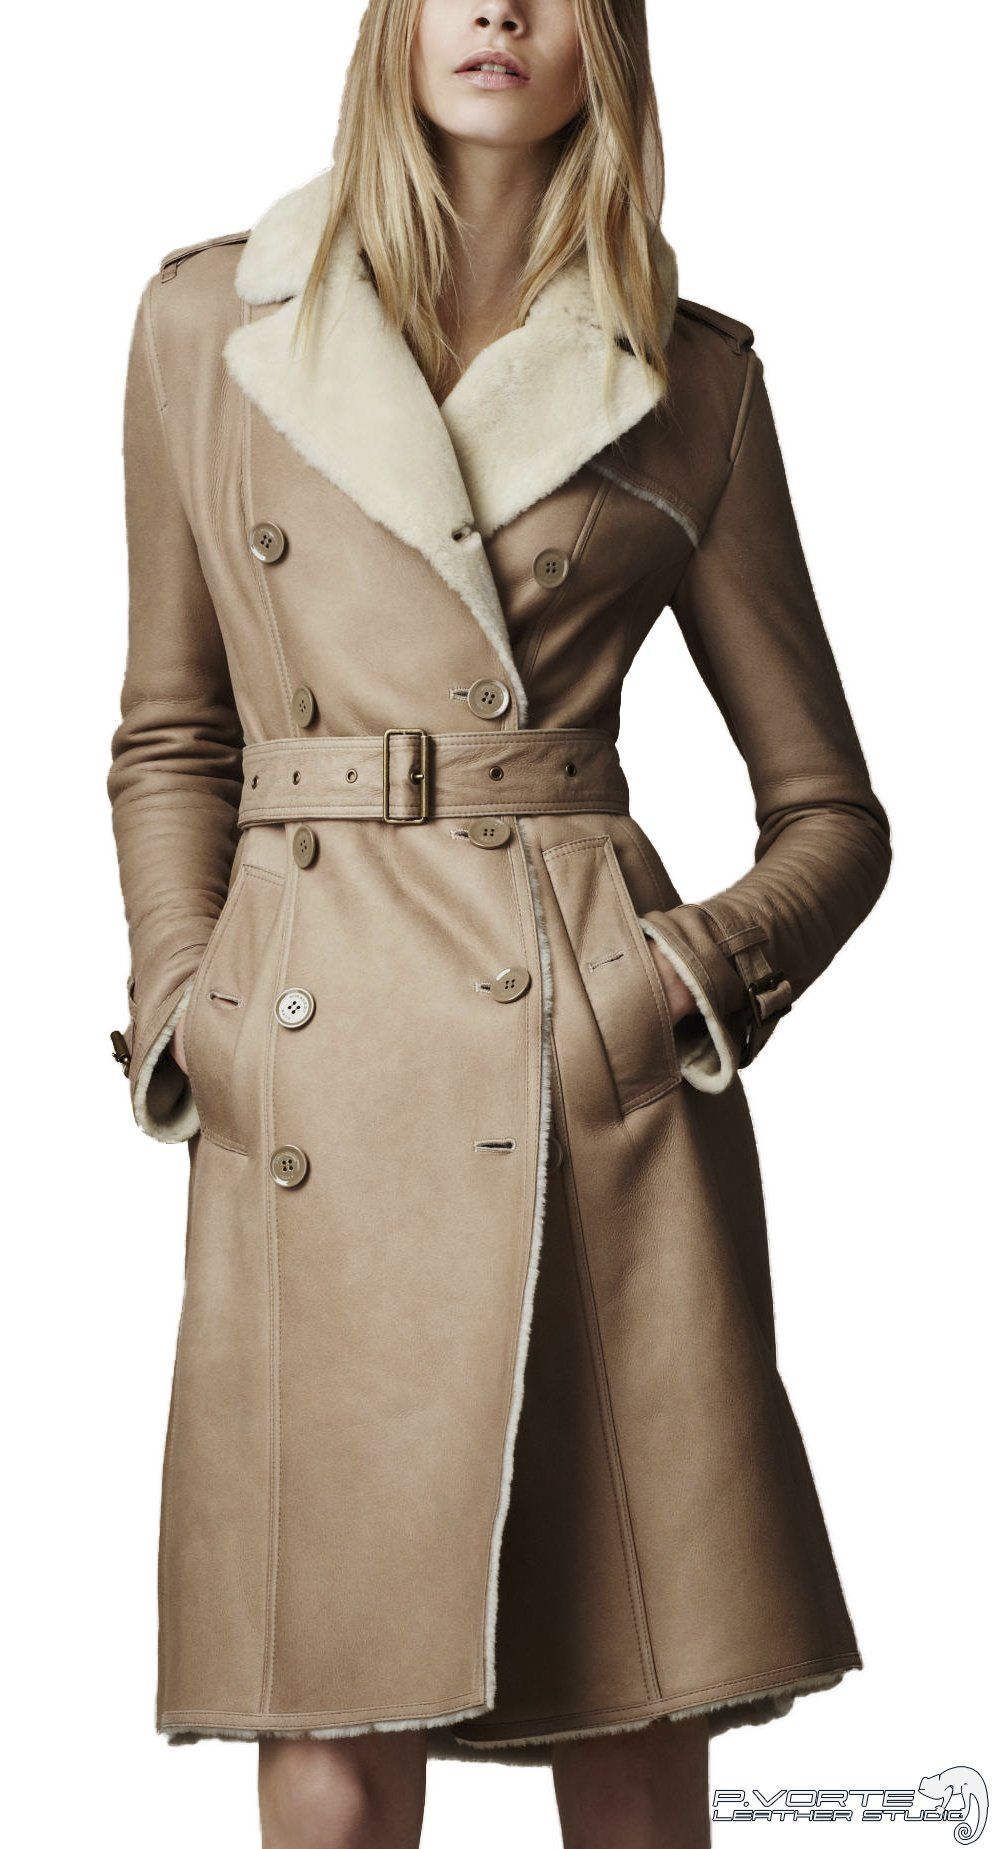 2d4e35a1e753 дубленка женская простая - Поиск в Google   Style   Coat, Burberry ...